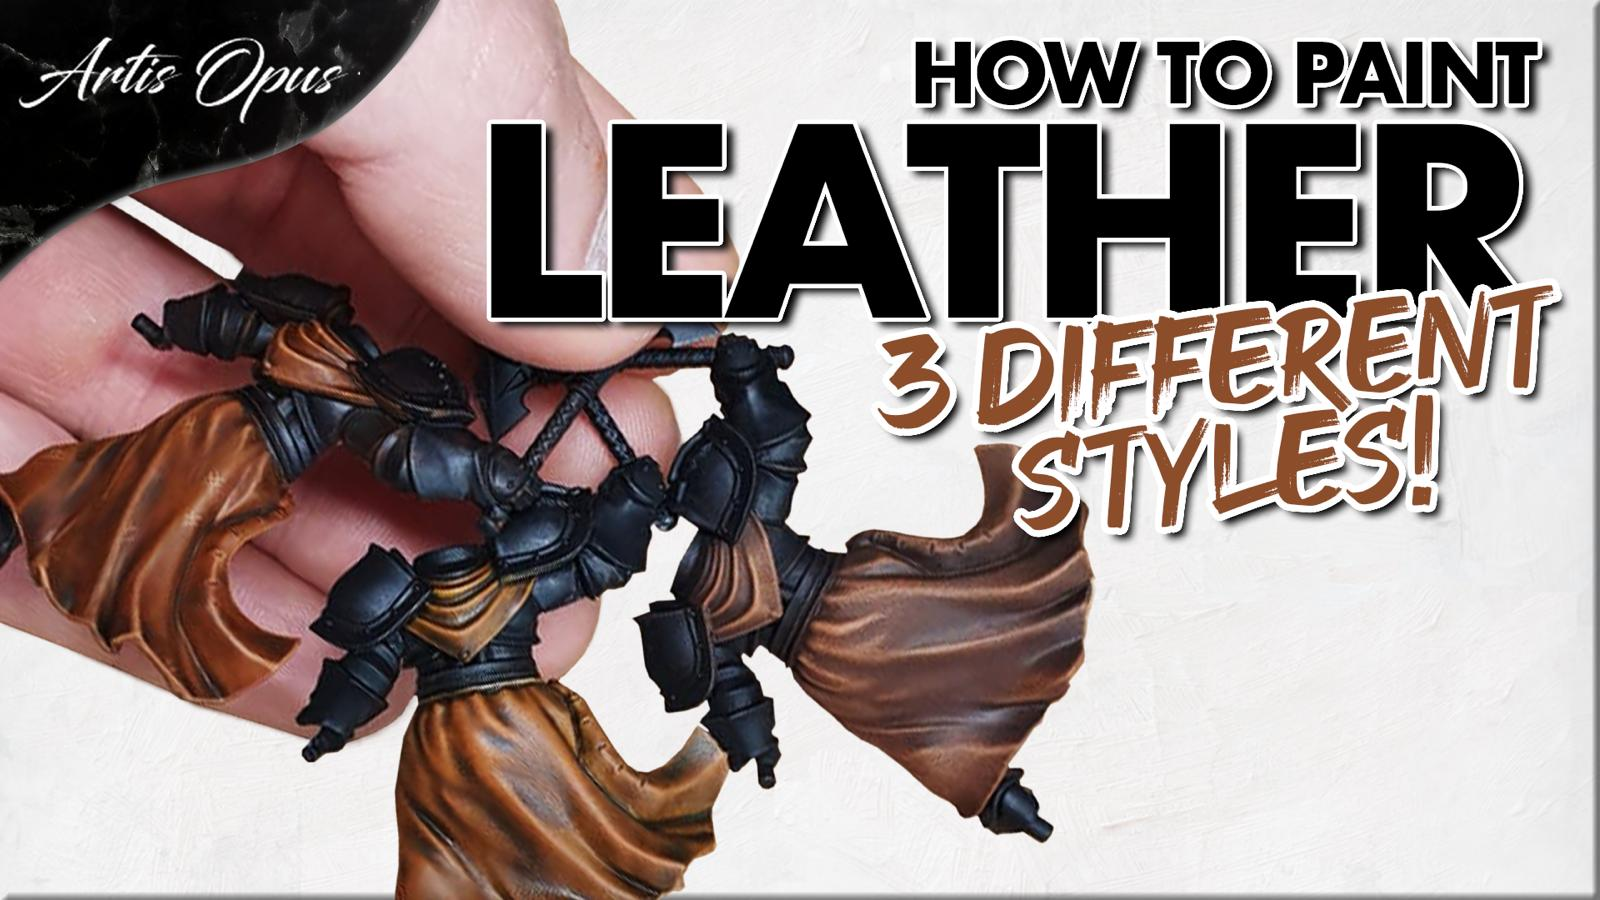 Artis Opus Painting Leather Tutorial Paint bunle